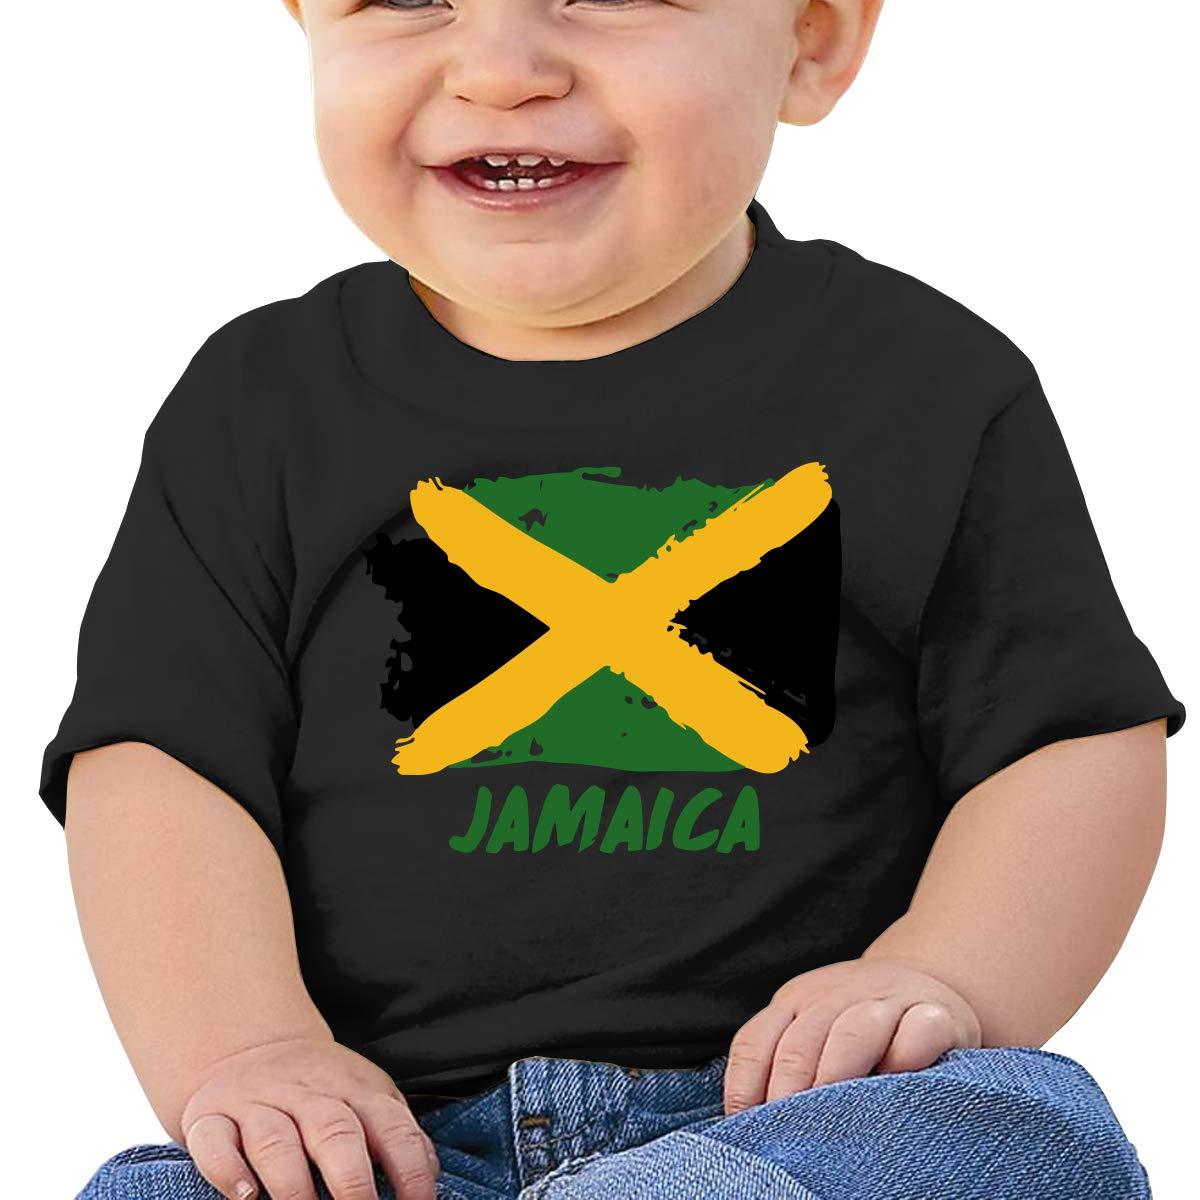 ZUGFGF-S3 Jamaica Flag Baby Girl Newborn Short Sleeve T-Shirt 6-24 Month Cotton Tops